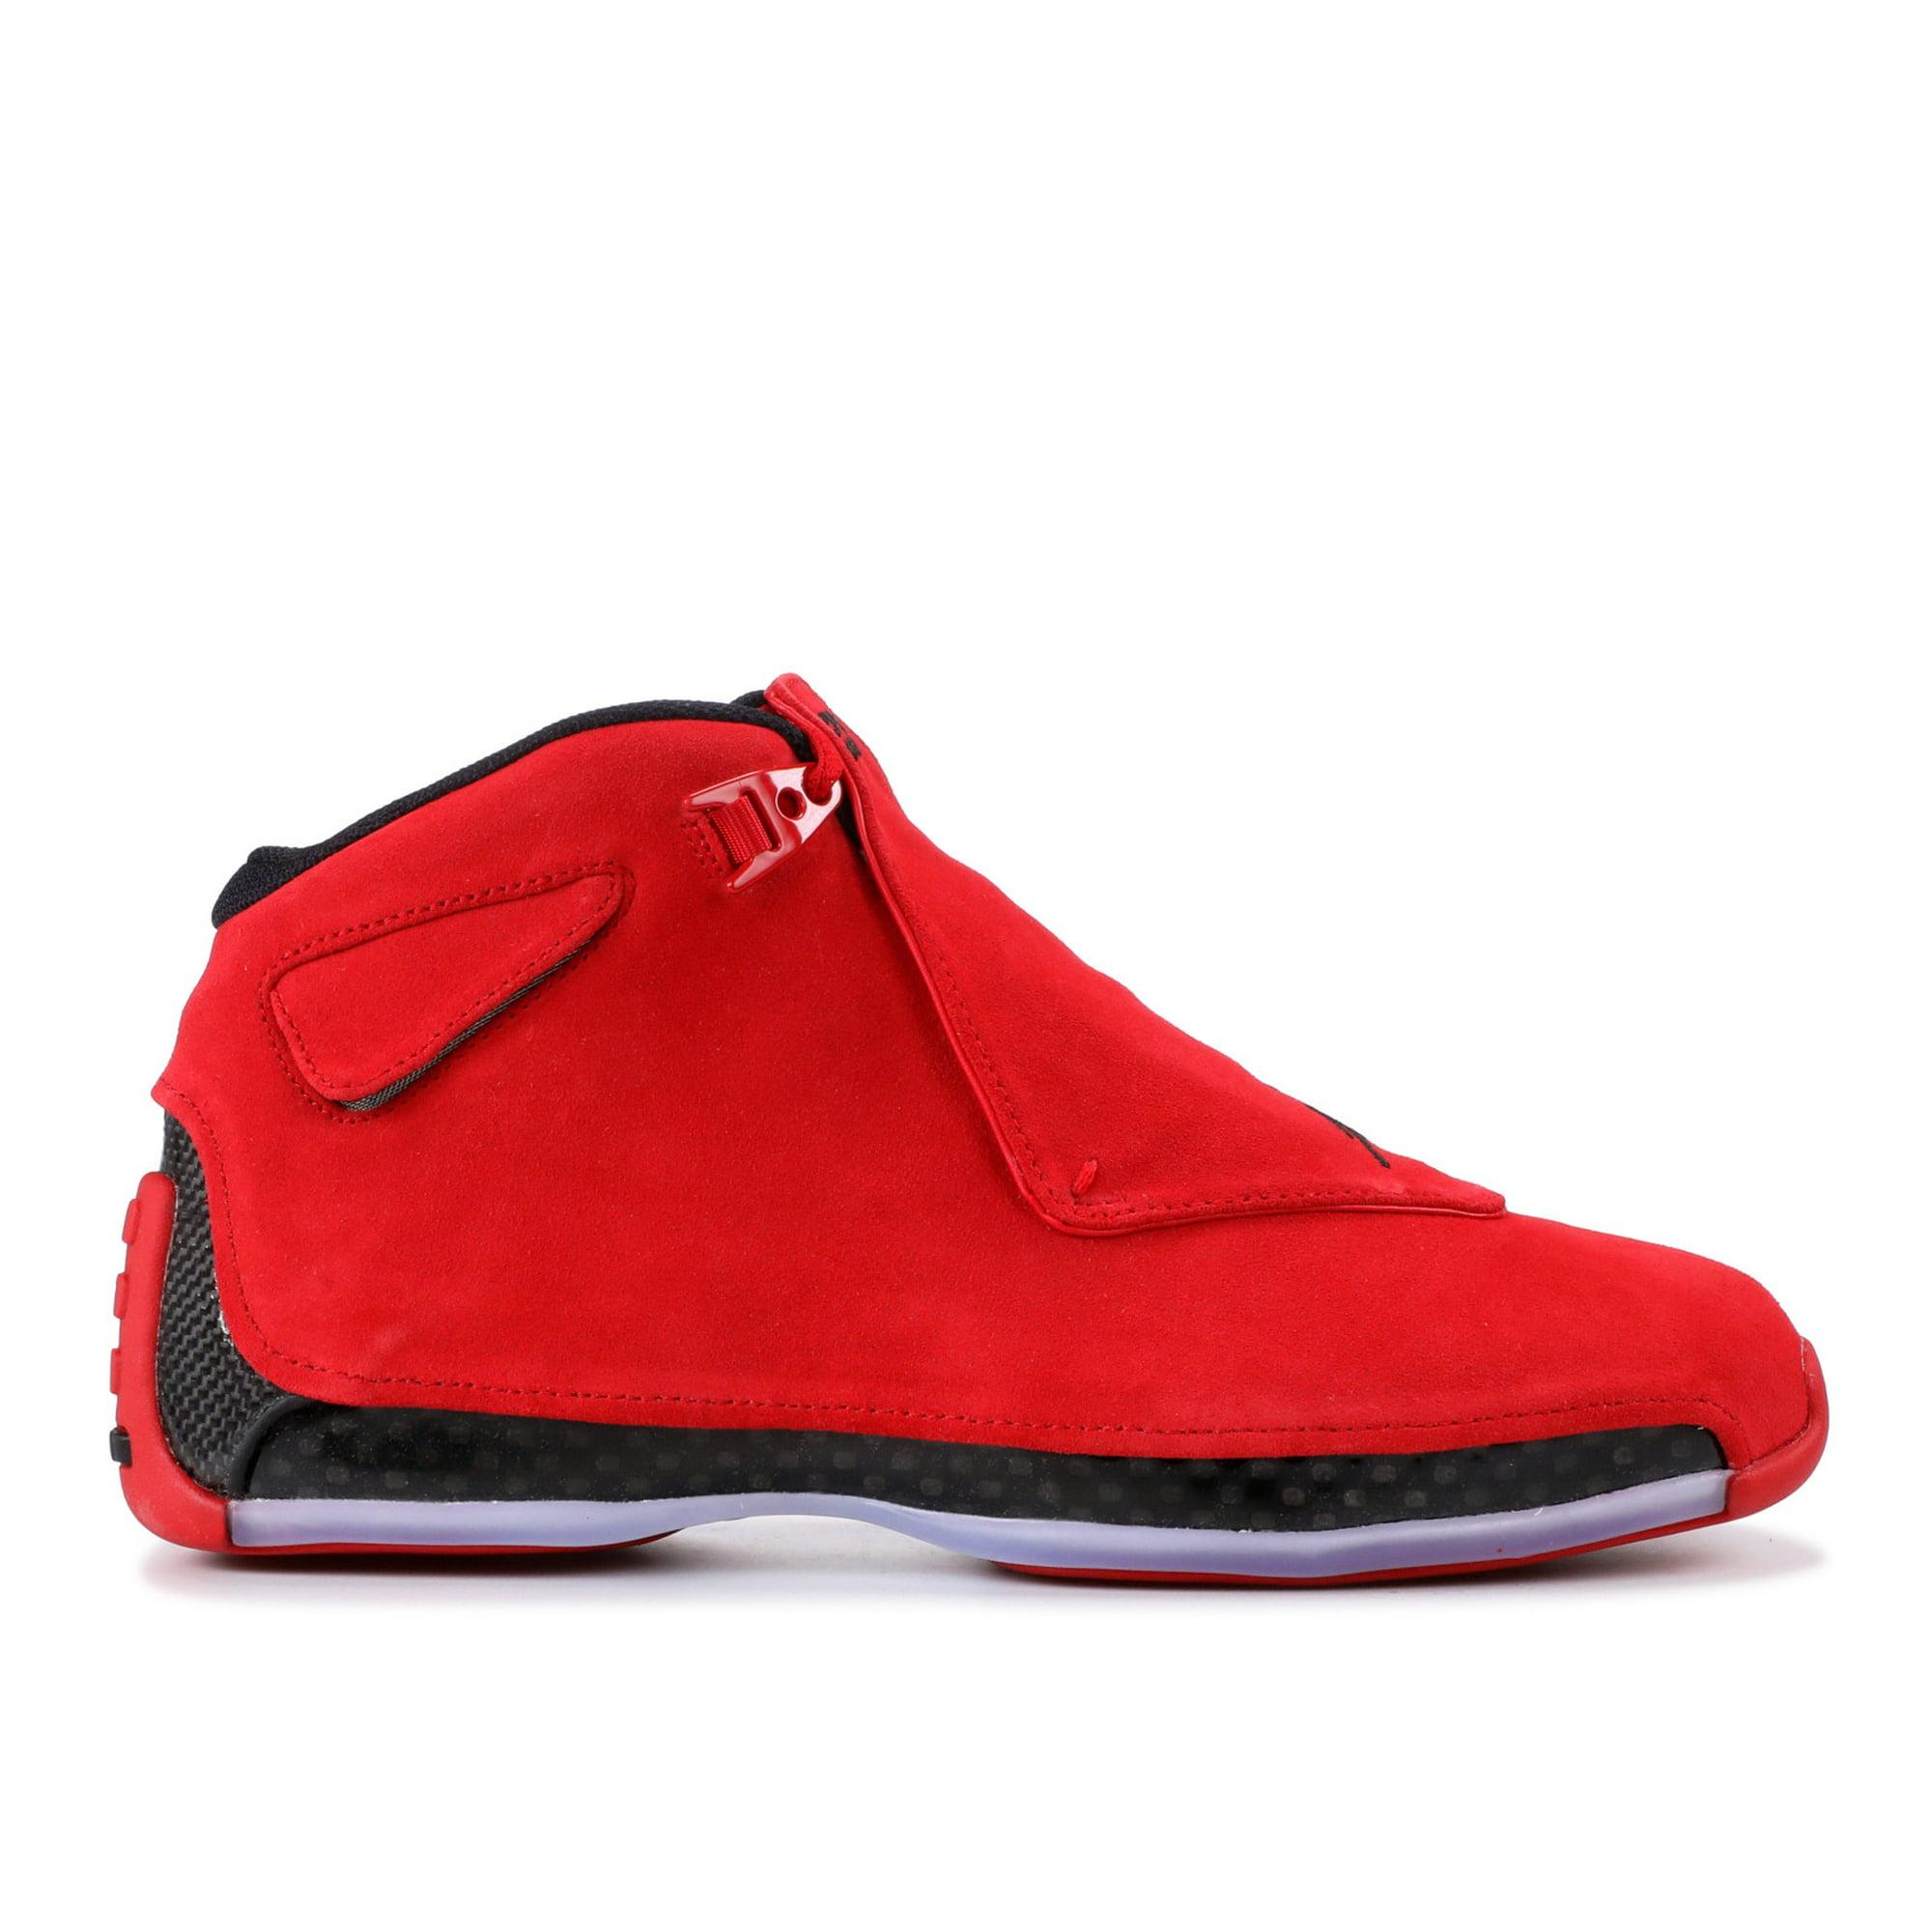 8f677e6a8a7 Air Jordan - Men - Air Jordan 18 Retro 'Red Suede' - Aa2494-601 - Size 11.5  | Walmart Canada